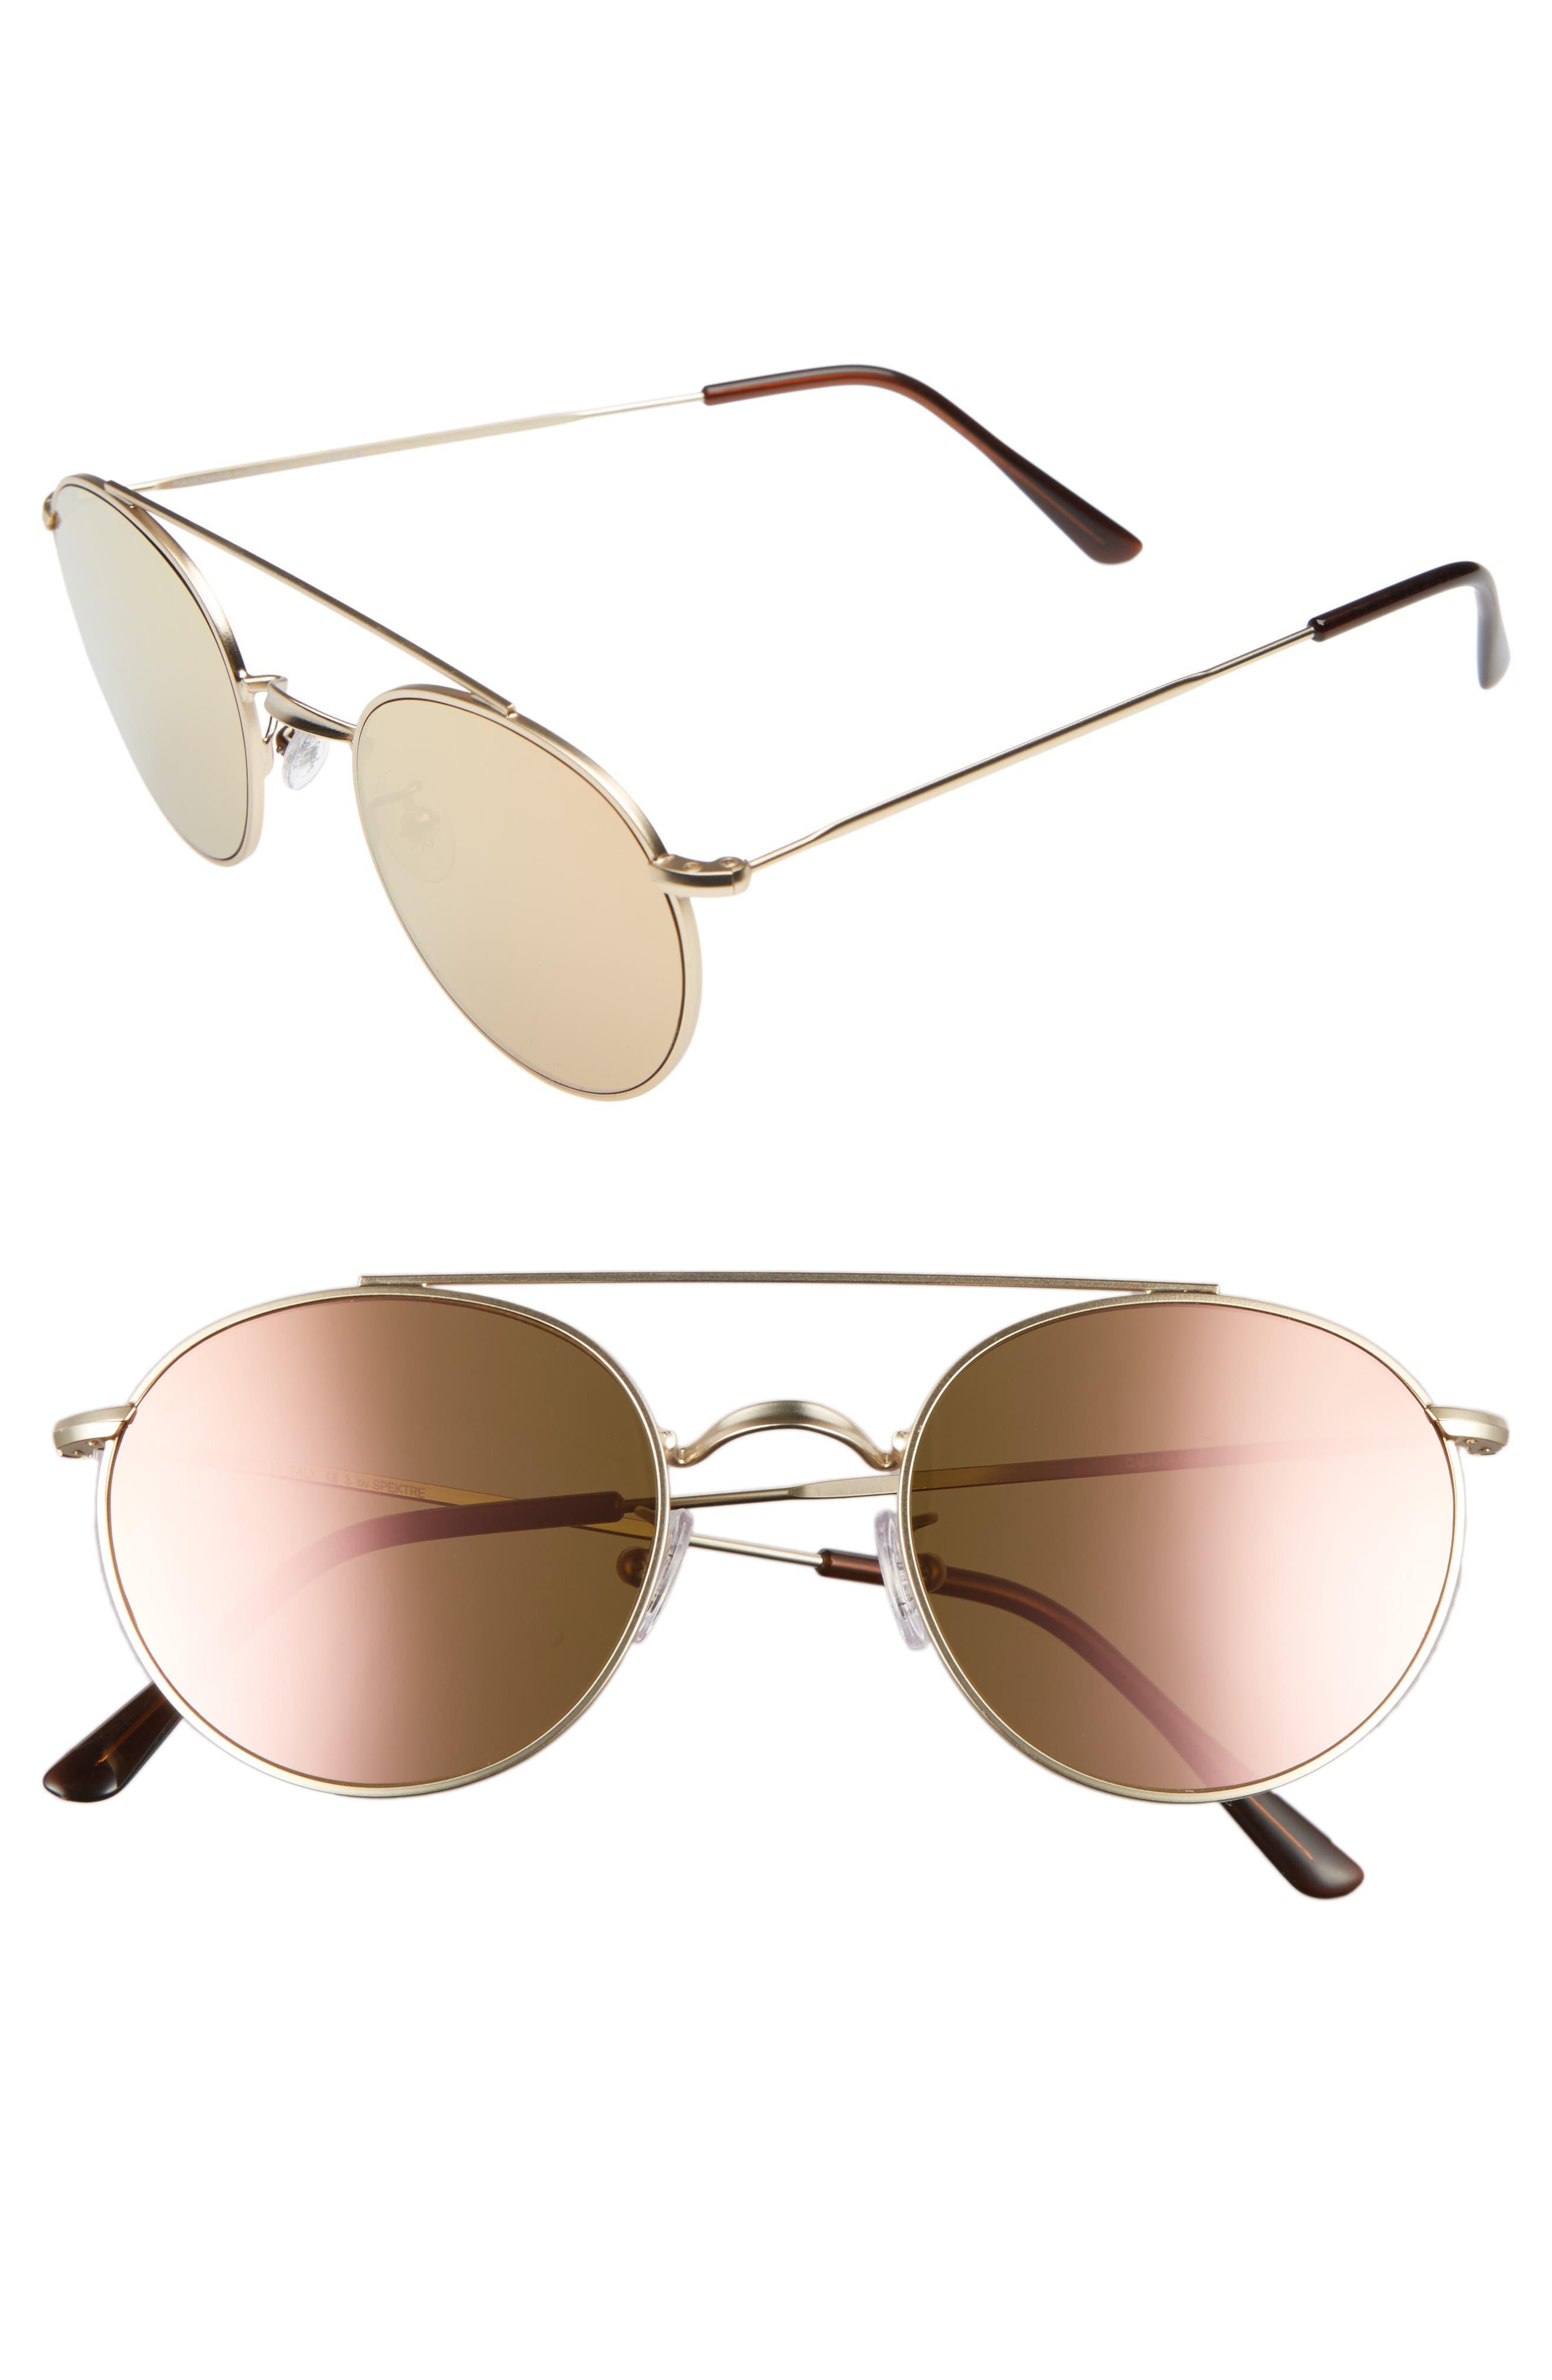 Spektre Caligola 50mm Aviator Sunglasses